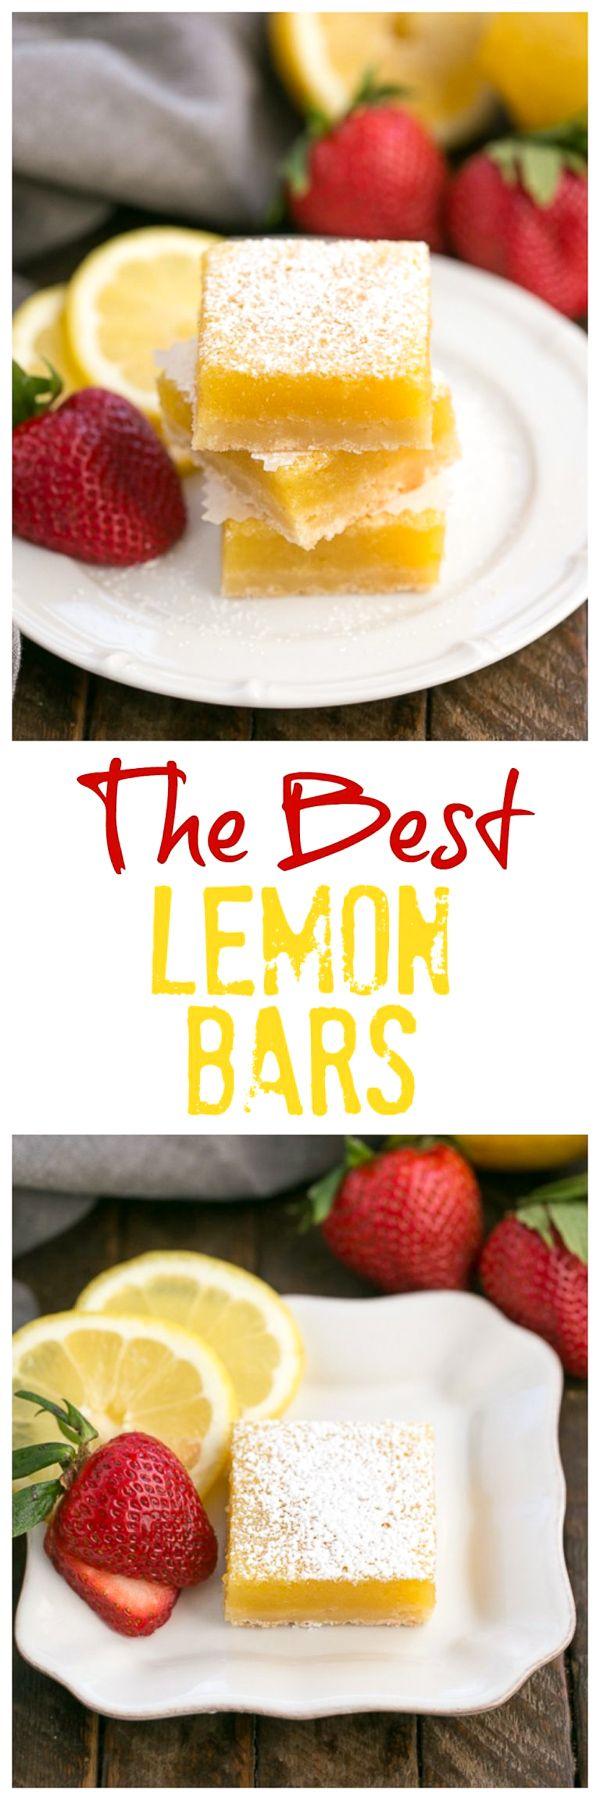 The Best Lemon Bars Recipe   A sublime citrus treat with a shortbread crust @lizzydo